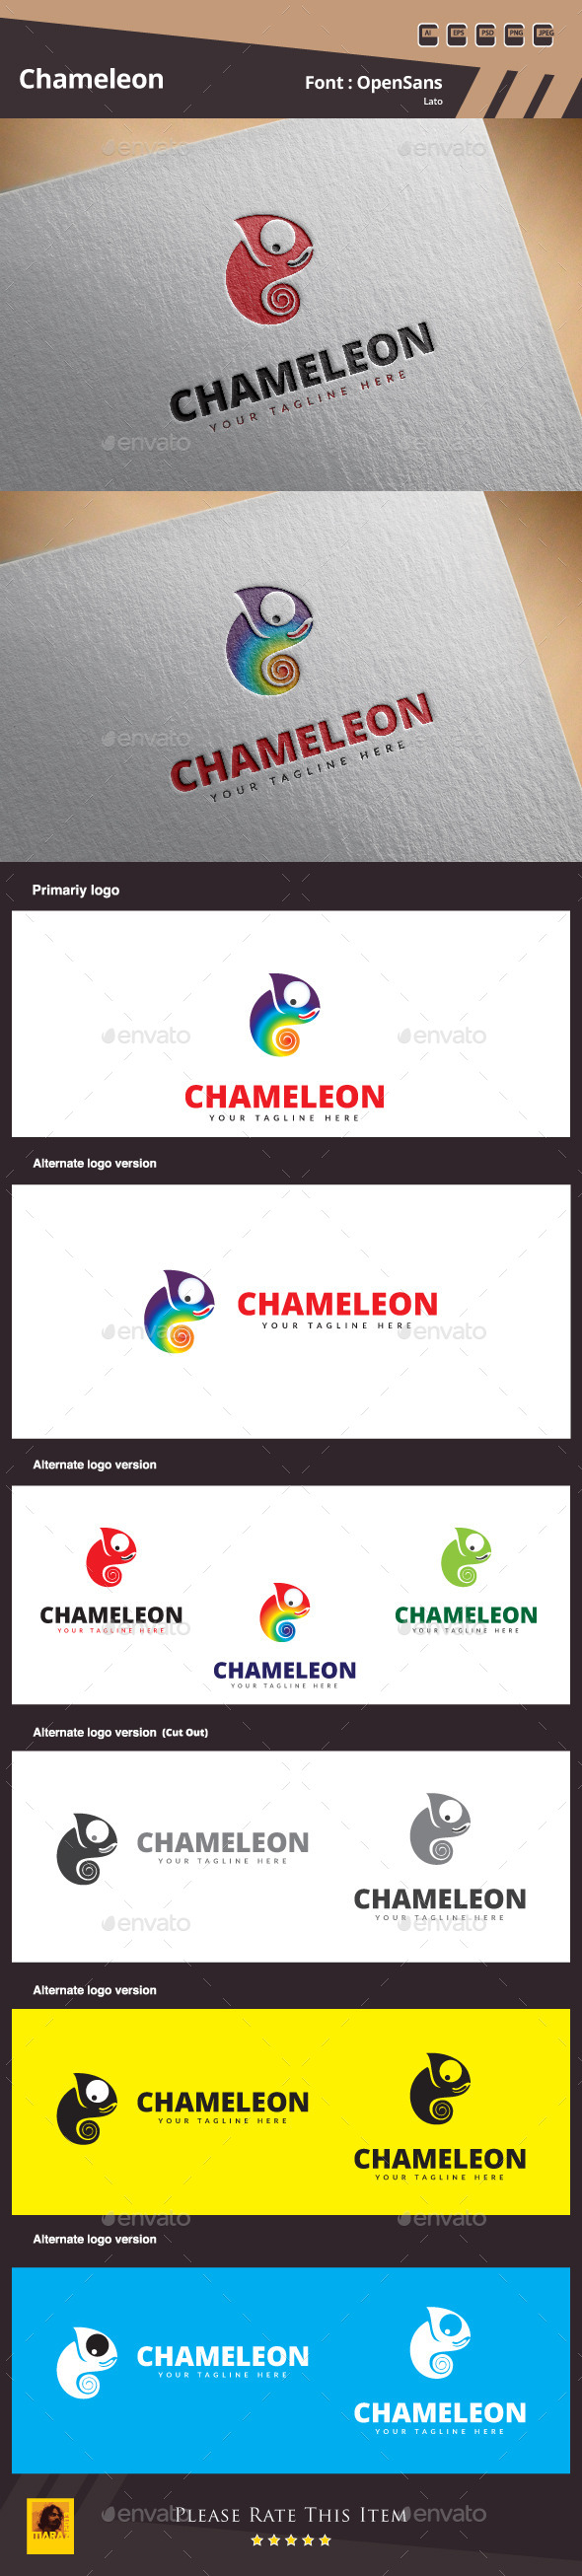 GraphicRiver Chameleon Logo Template 11103744